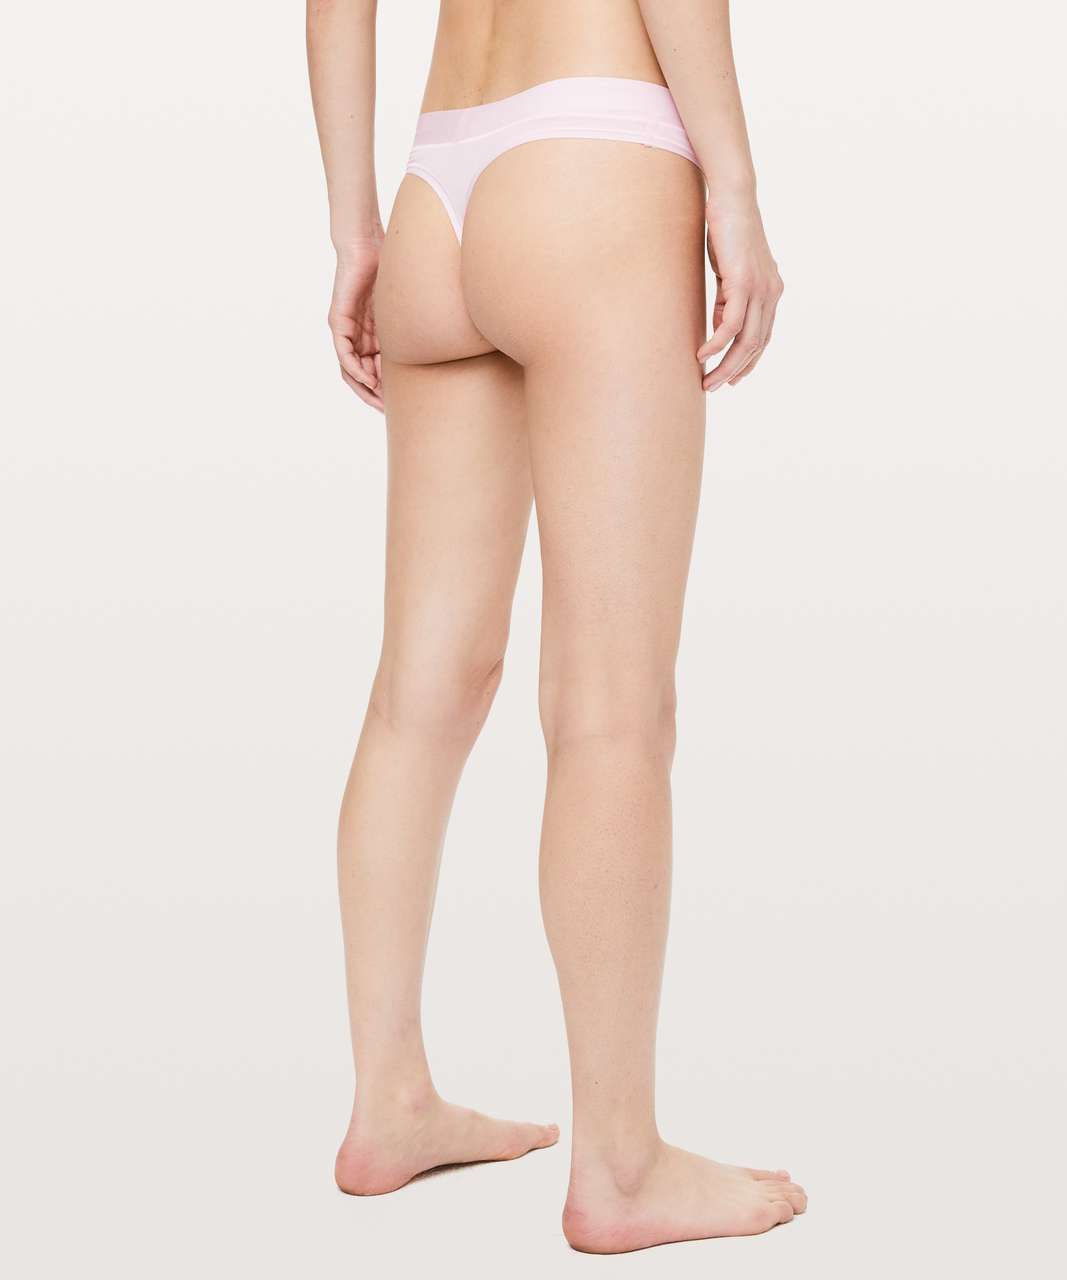 Lululemon Mula Bandhawear Thong *3 Pack - Pink Glow / Washed Marble Alpine White Silverscreen / Blue Cast